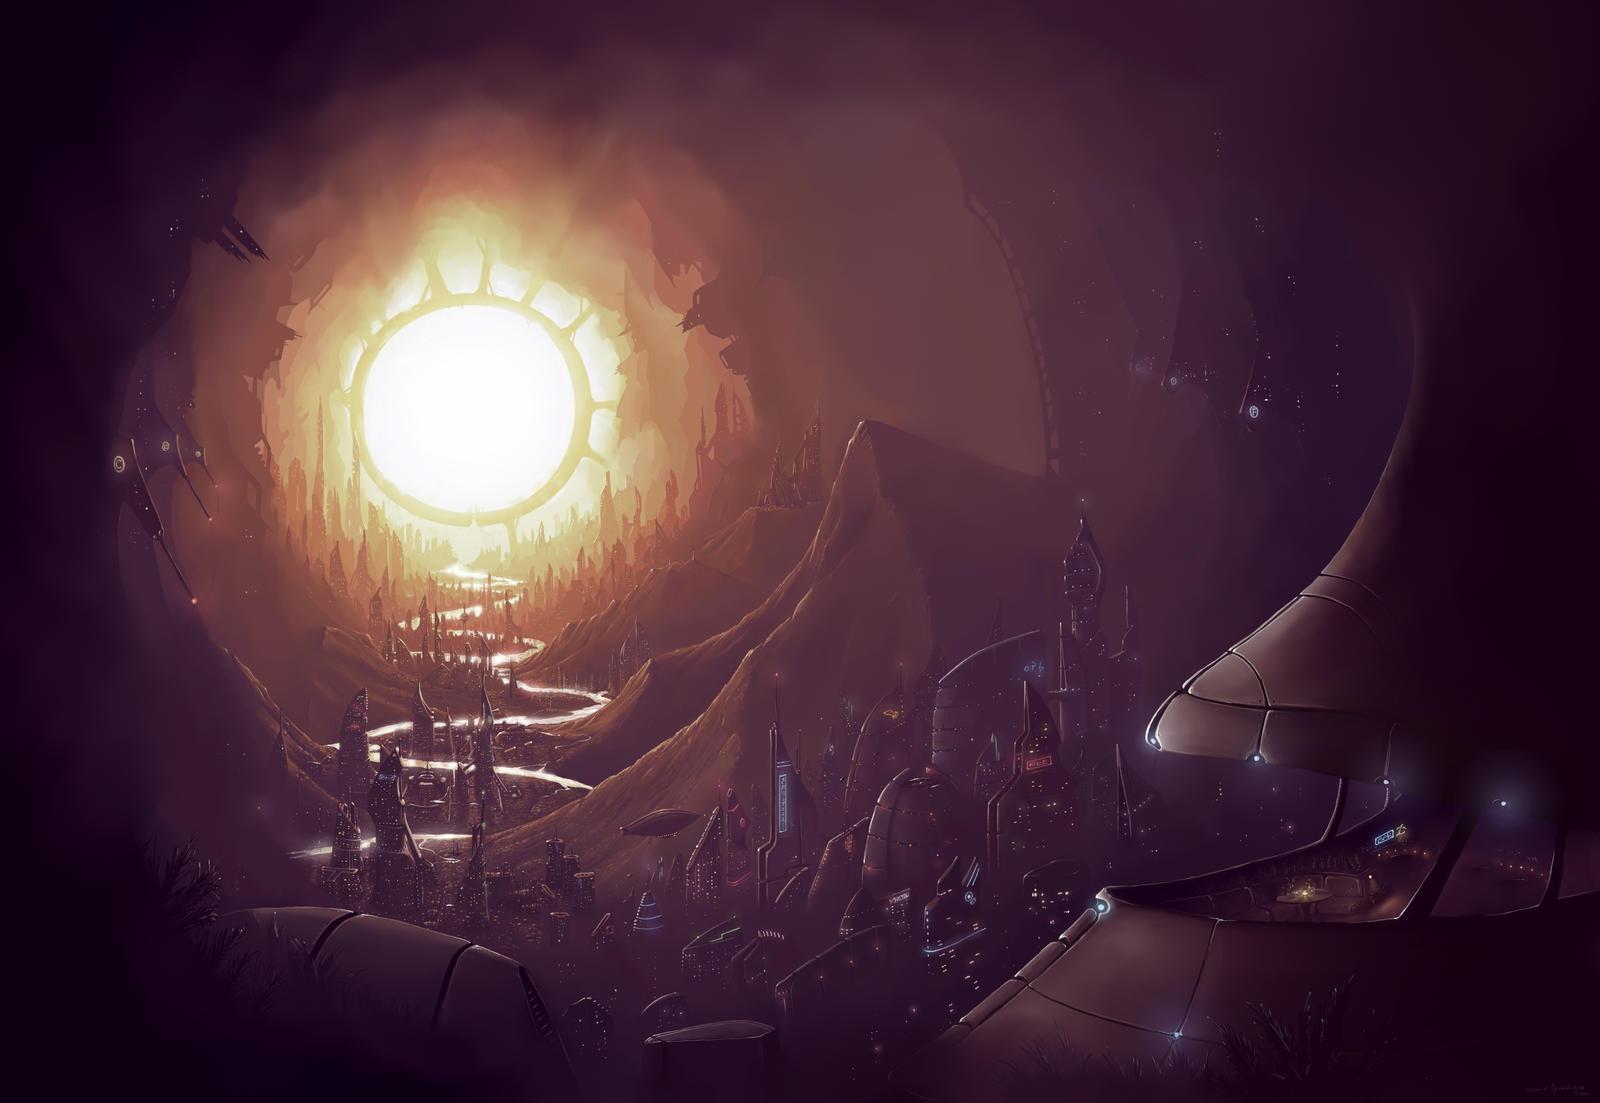 solstace by liquidminduk